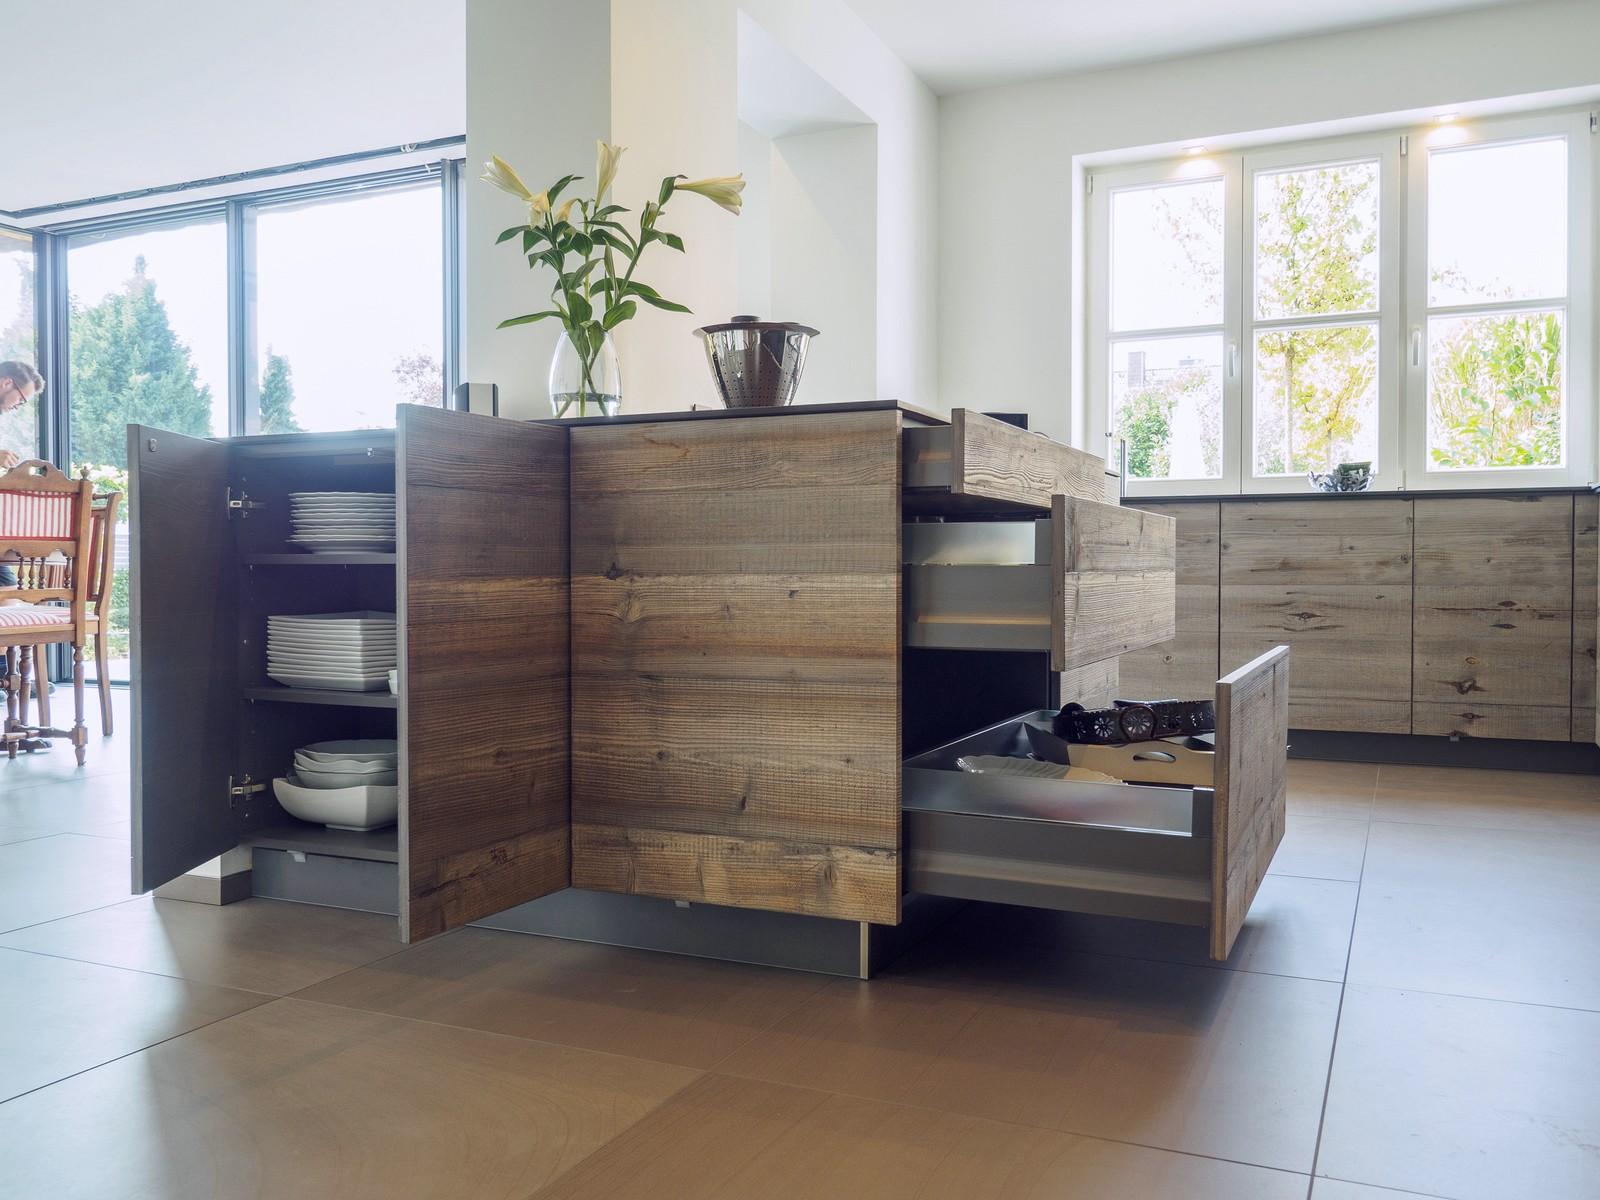 Kueche Exklusiv Design Fronten Holz Furnier Sonnenverbrannt Stahl Keramik Arbeitsplatte Miele 36